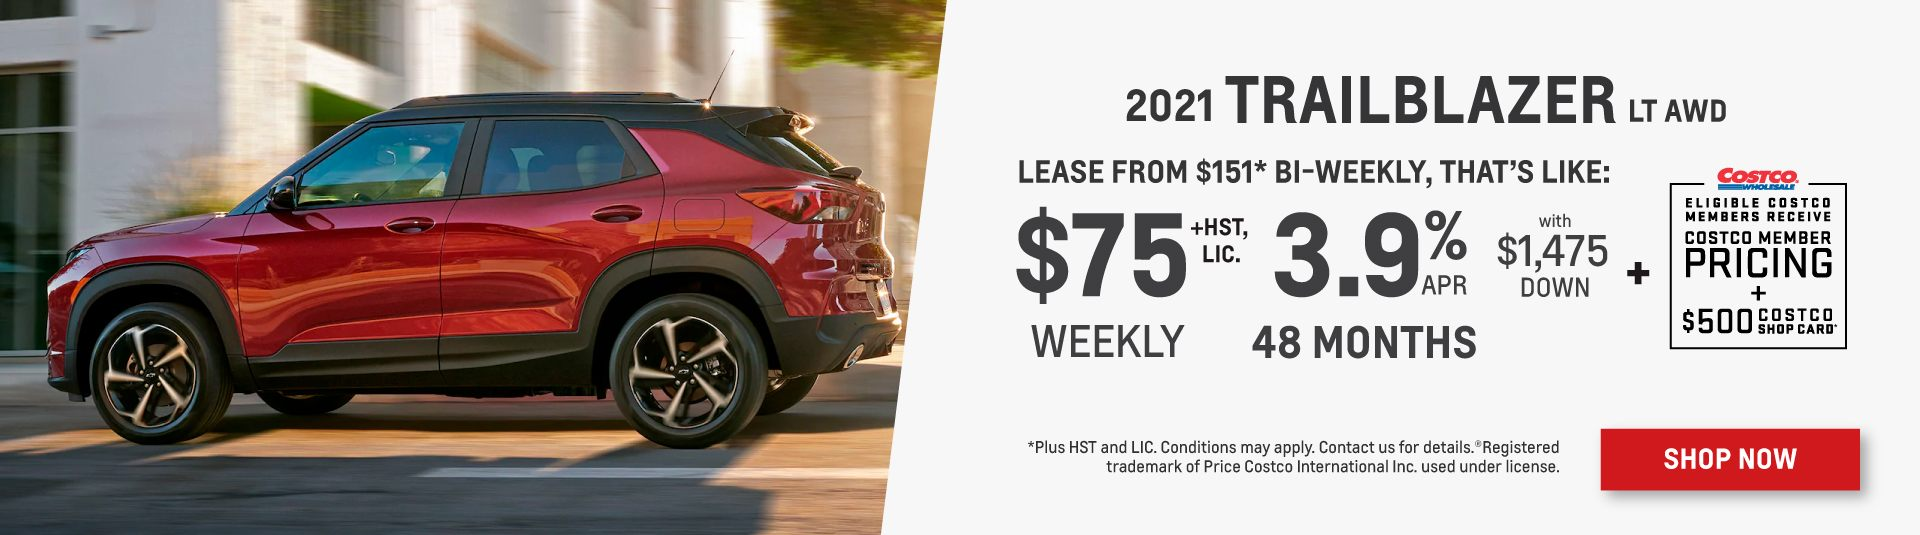 2021 Chevrolet Trailblazer Offer in Toronto